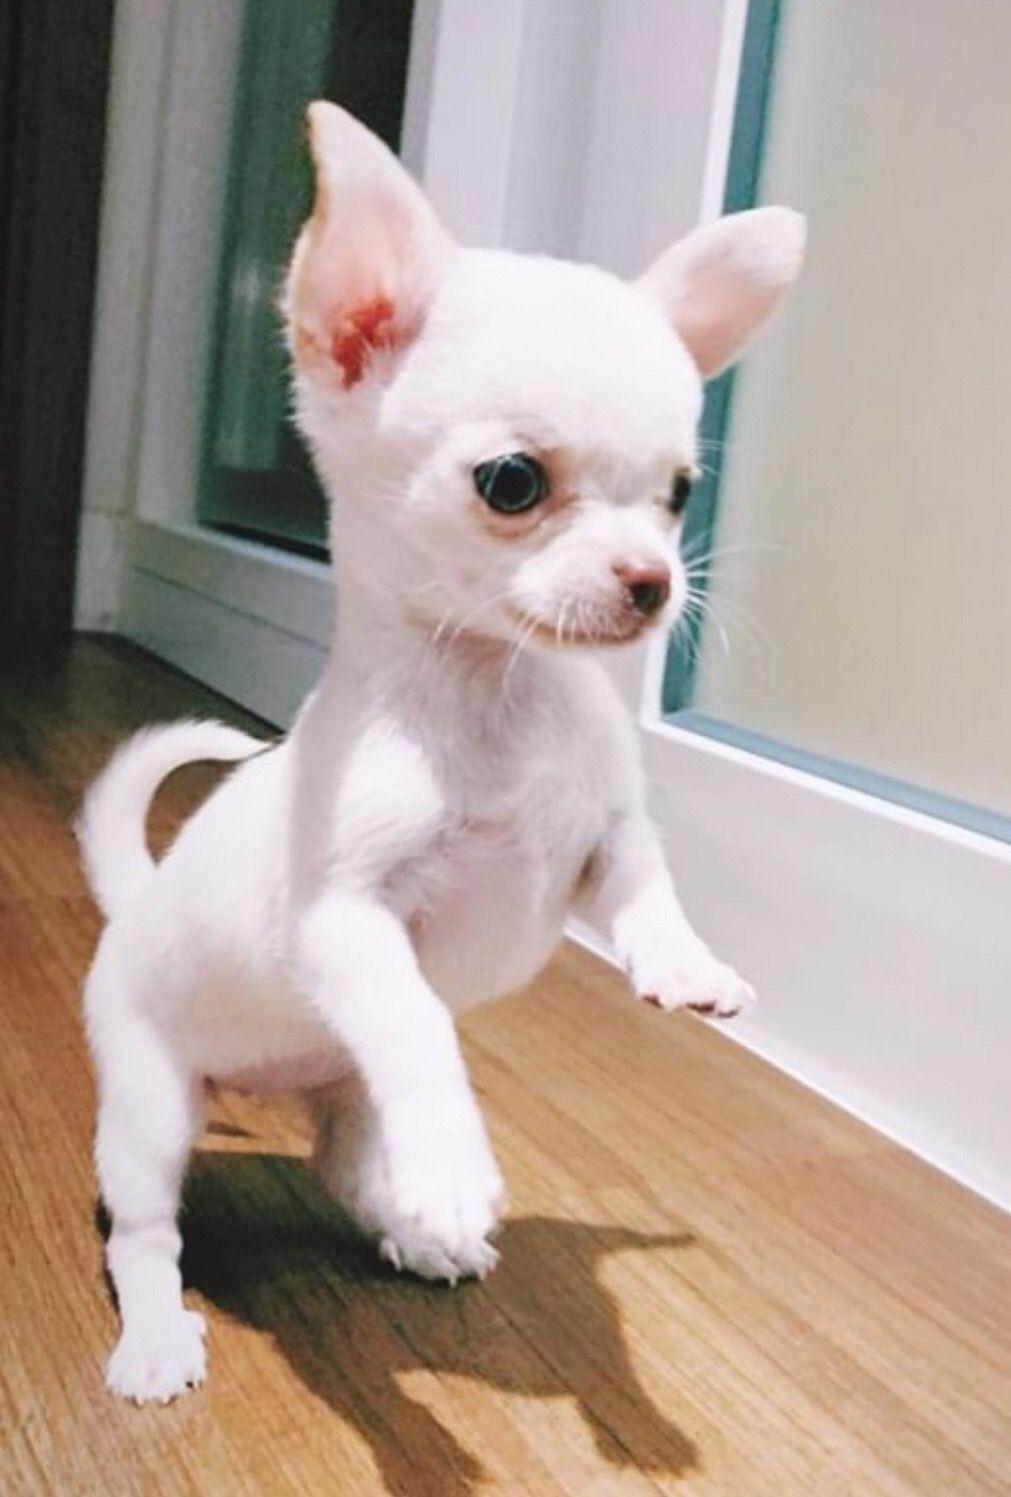 Chihuahua Chiwawa Chihuahua Puppies Teacup Chihuahua Puppies Cute Chihuahua